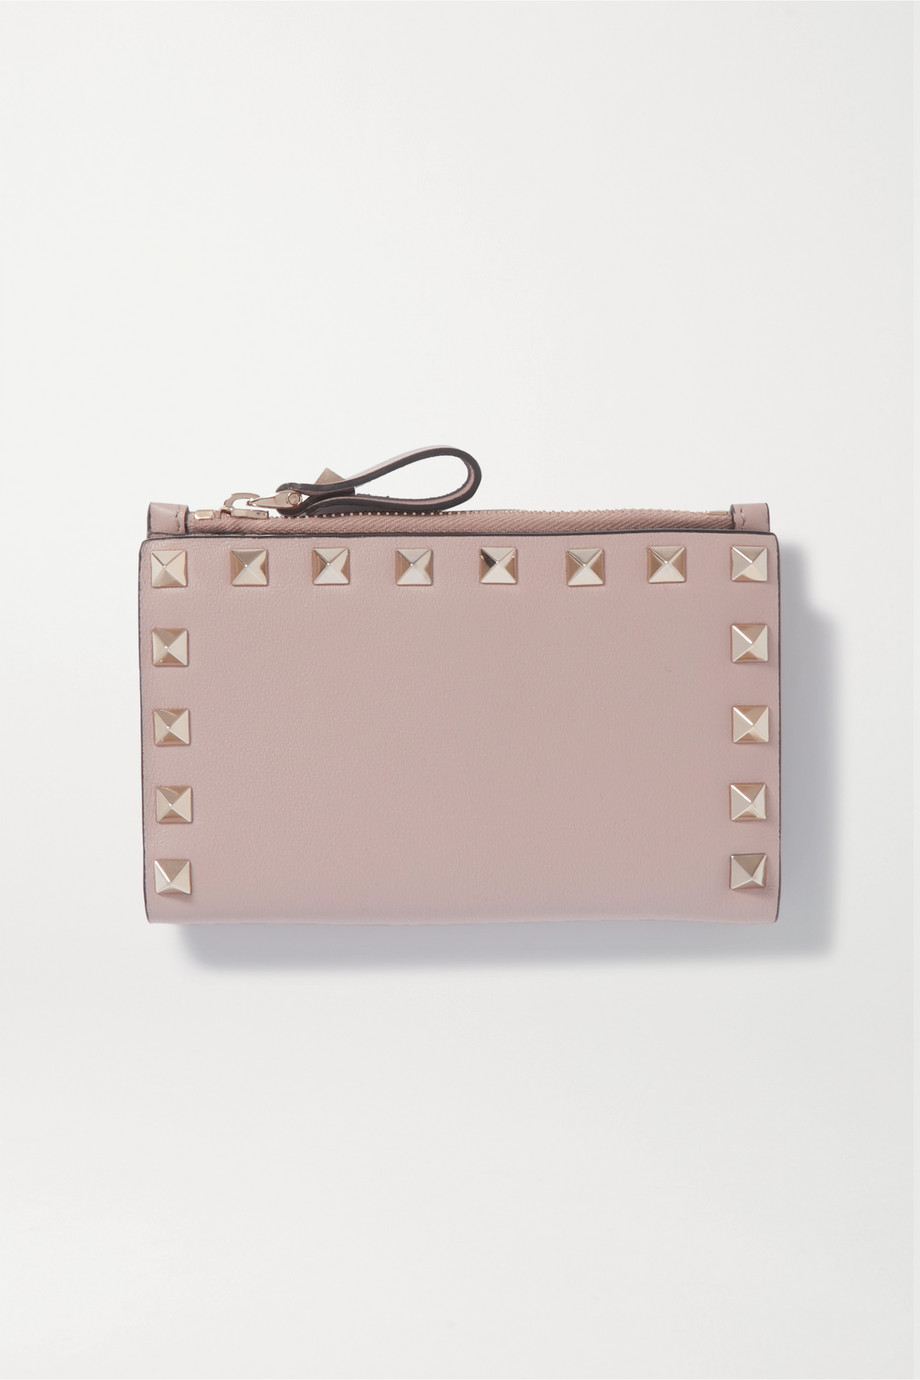 Valentino Valentino Garavani Rockstud leather wallet